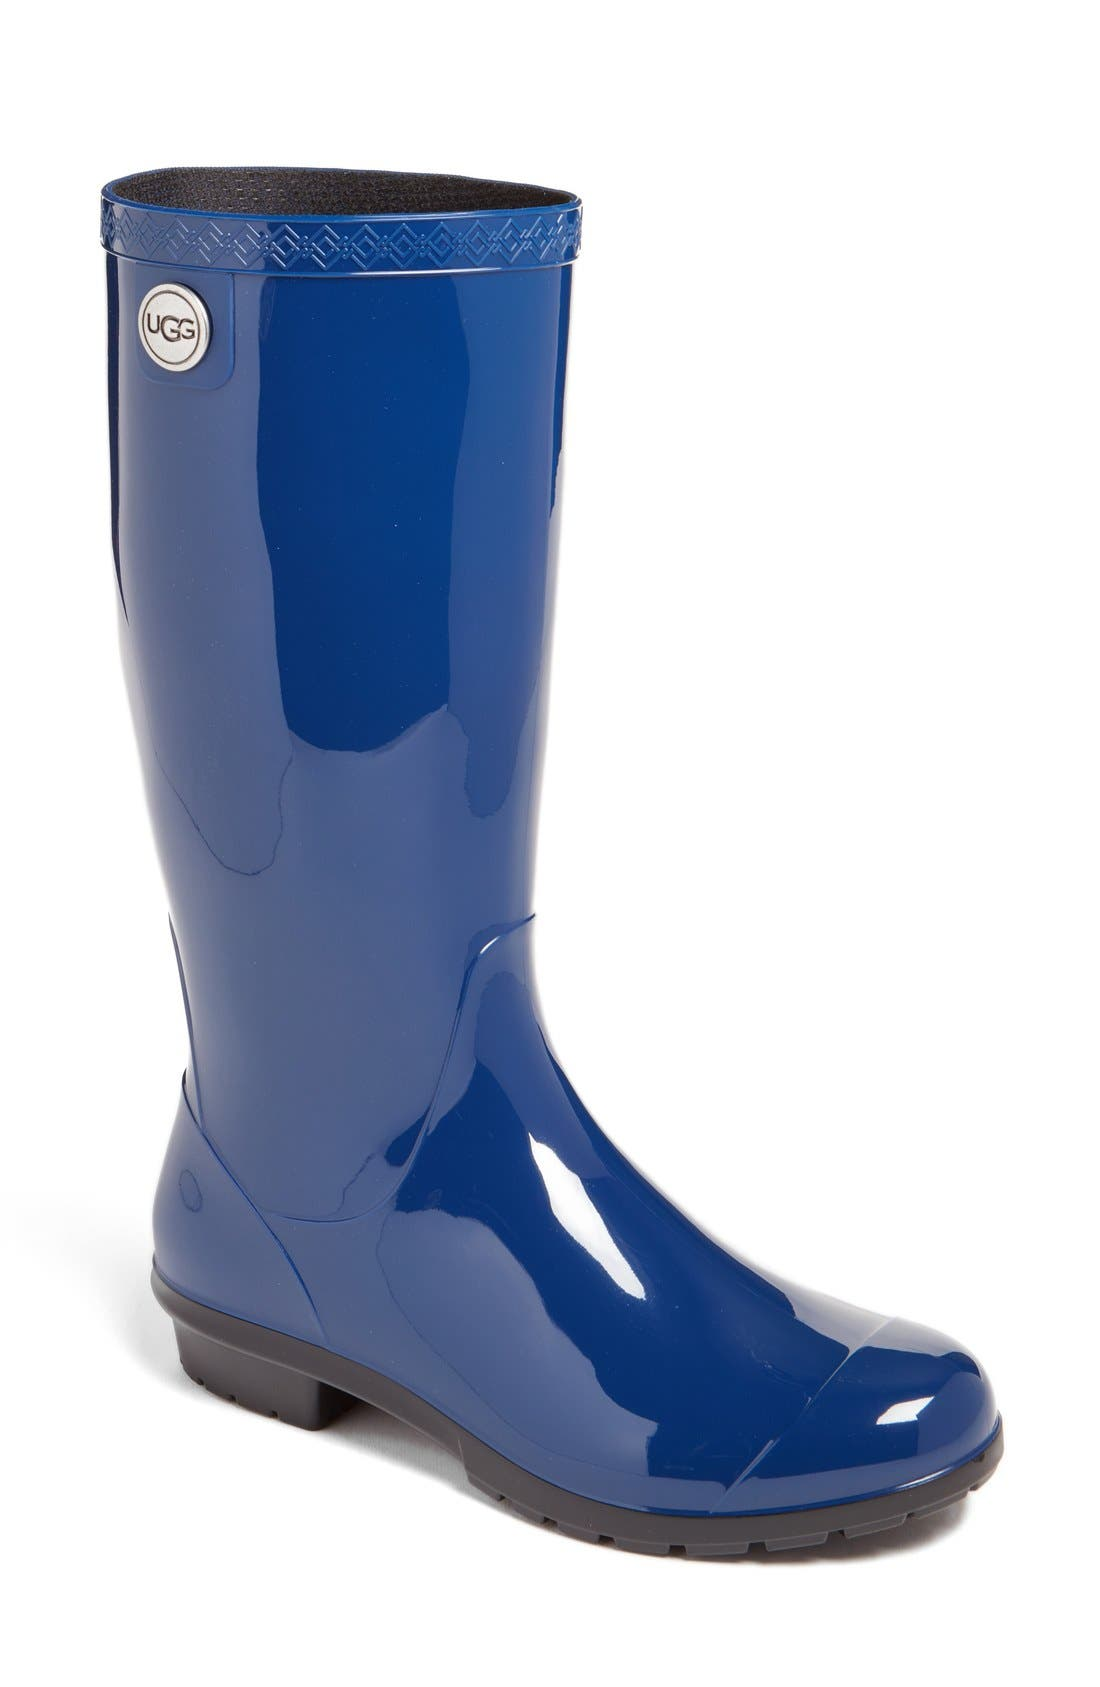 Main Image - UGG® 'Shaye' Rain Boot (Women)